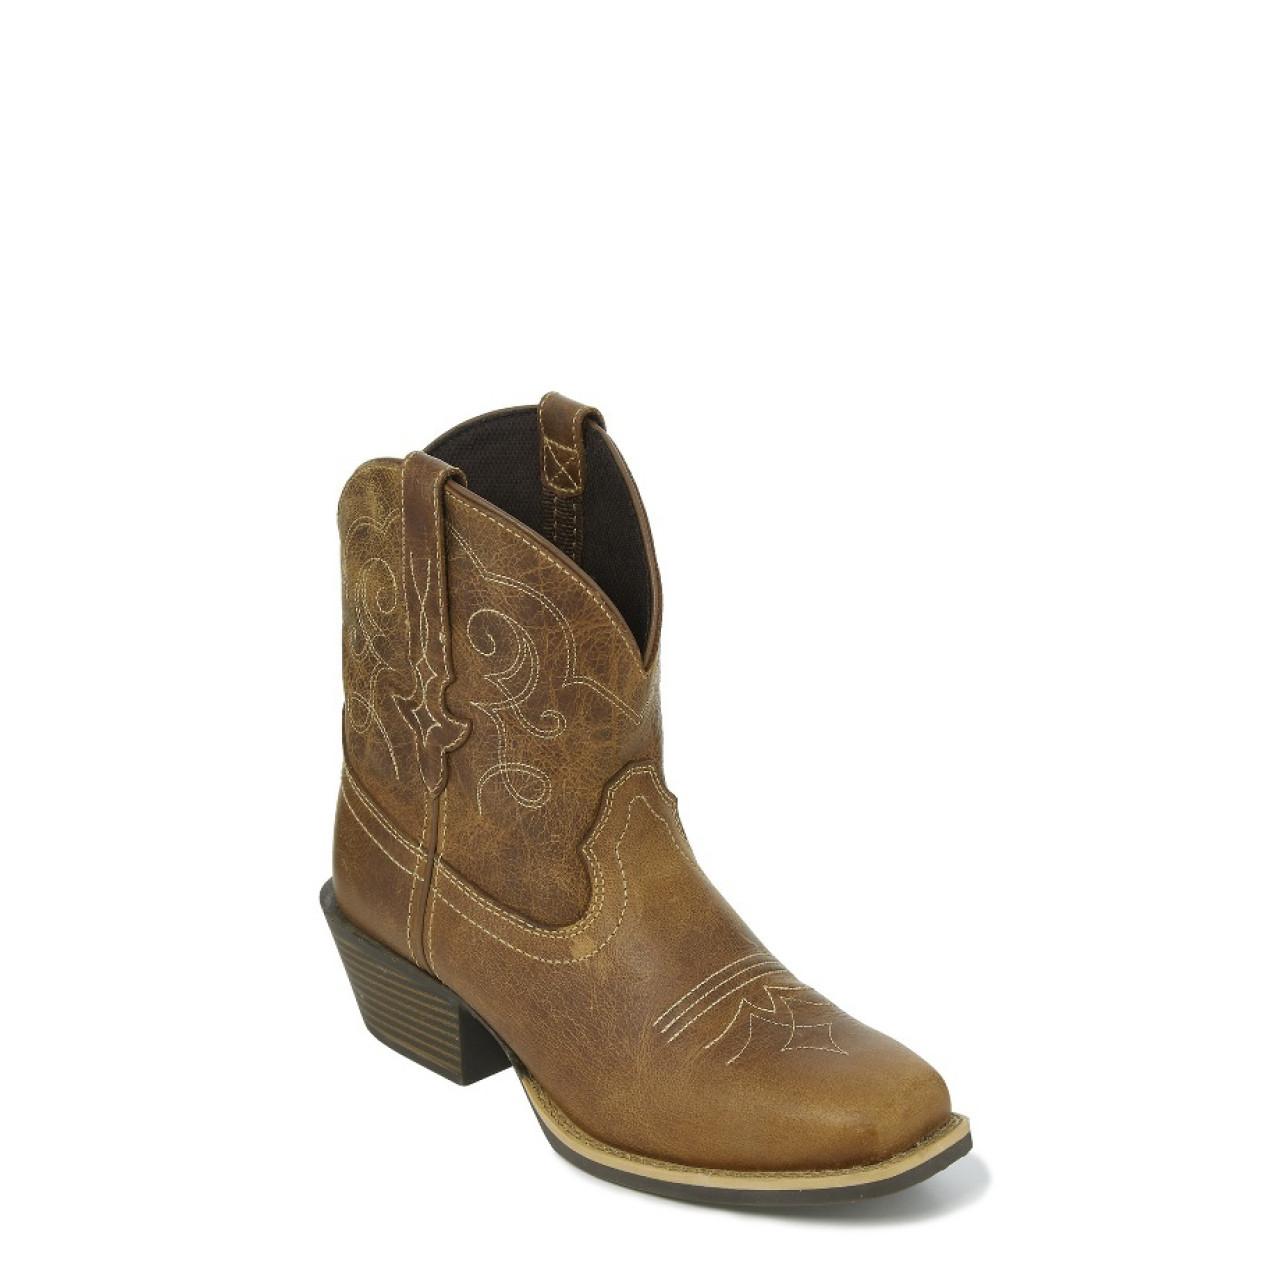 463902e9af8 Justin Women's Chellie Cowboy Boots - Tan